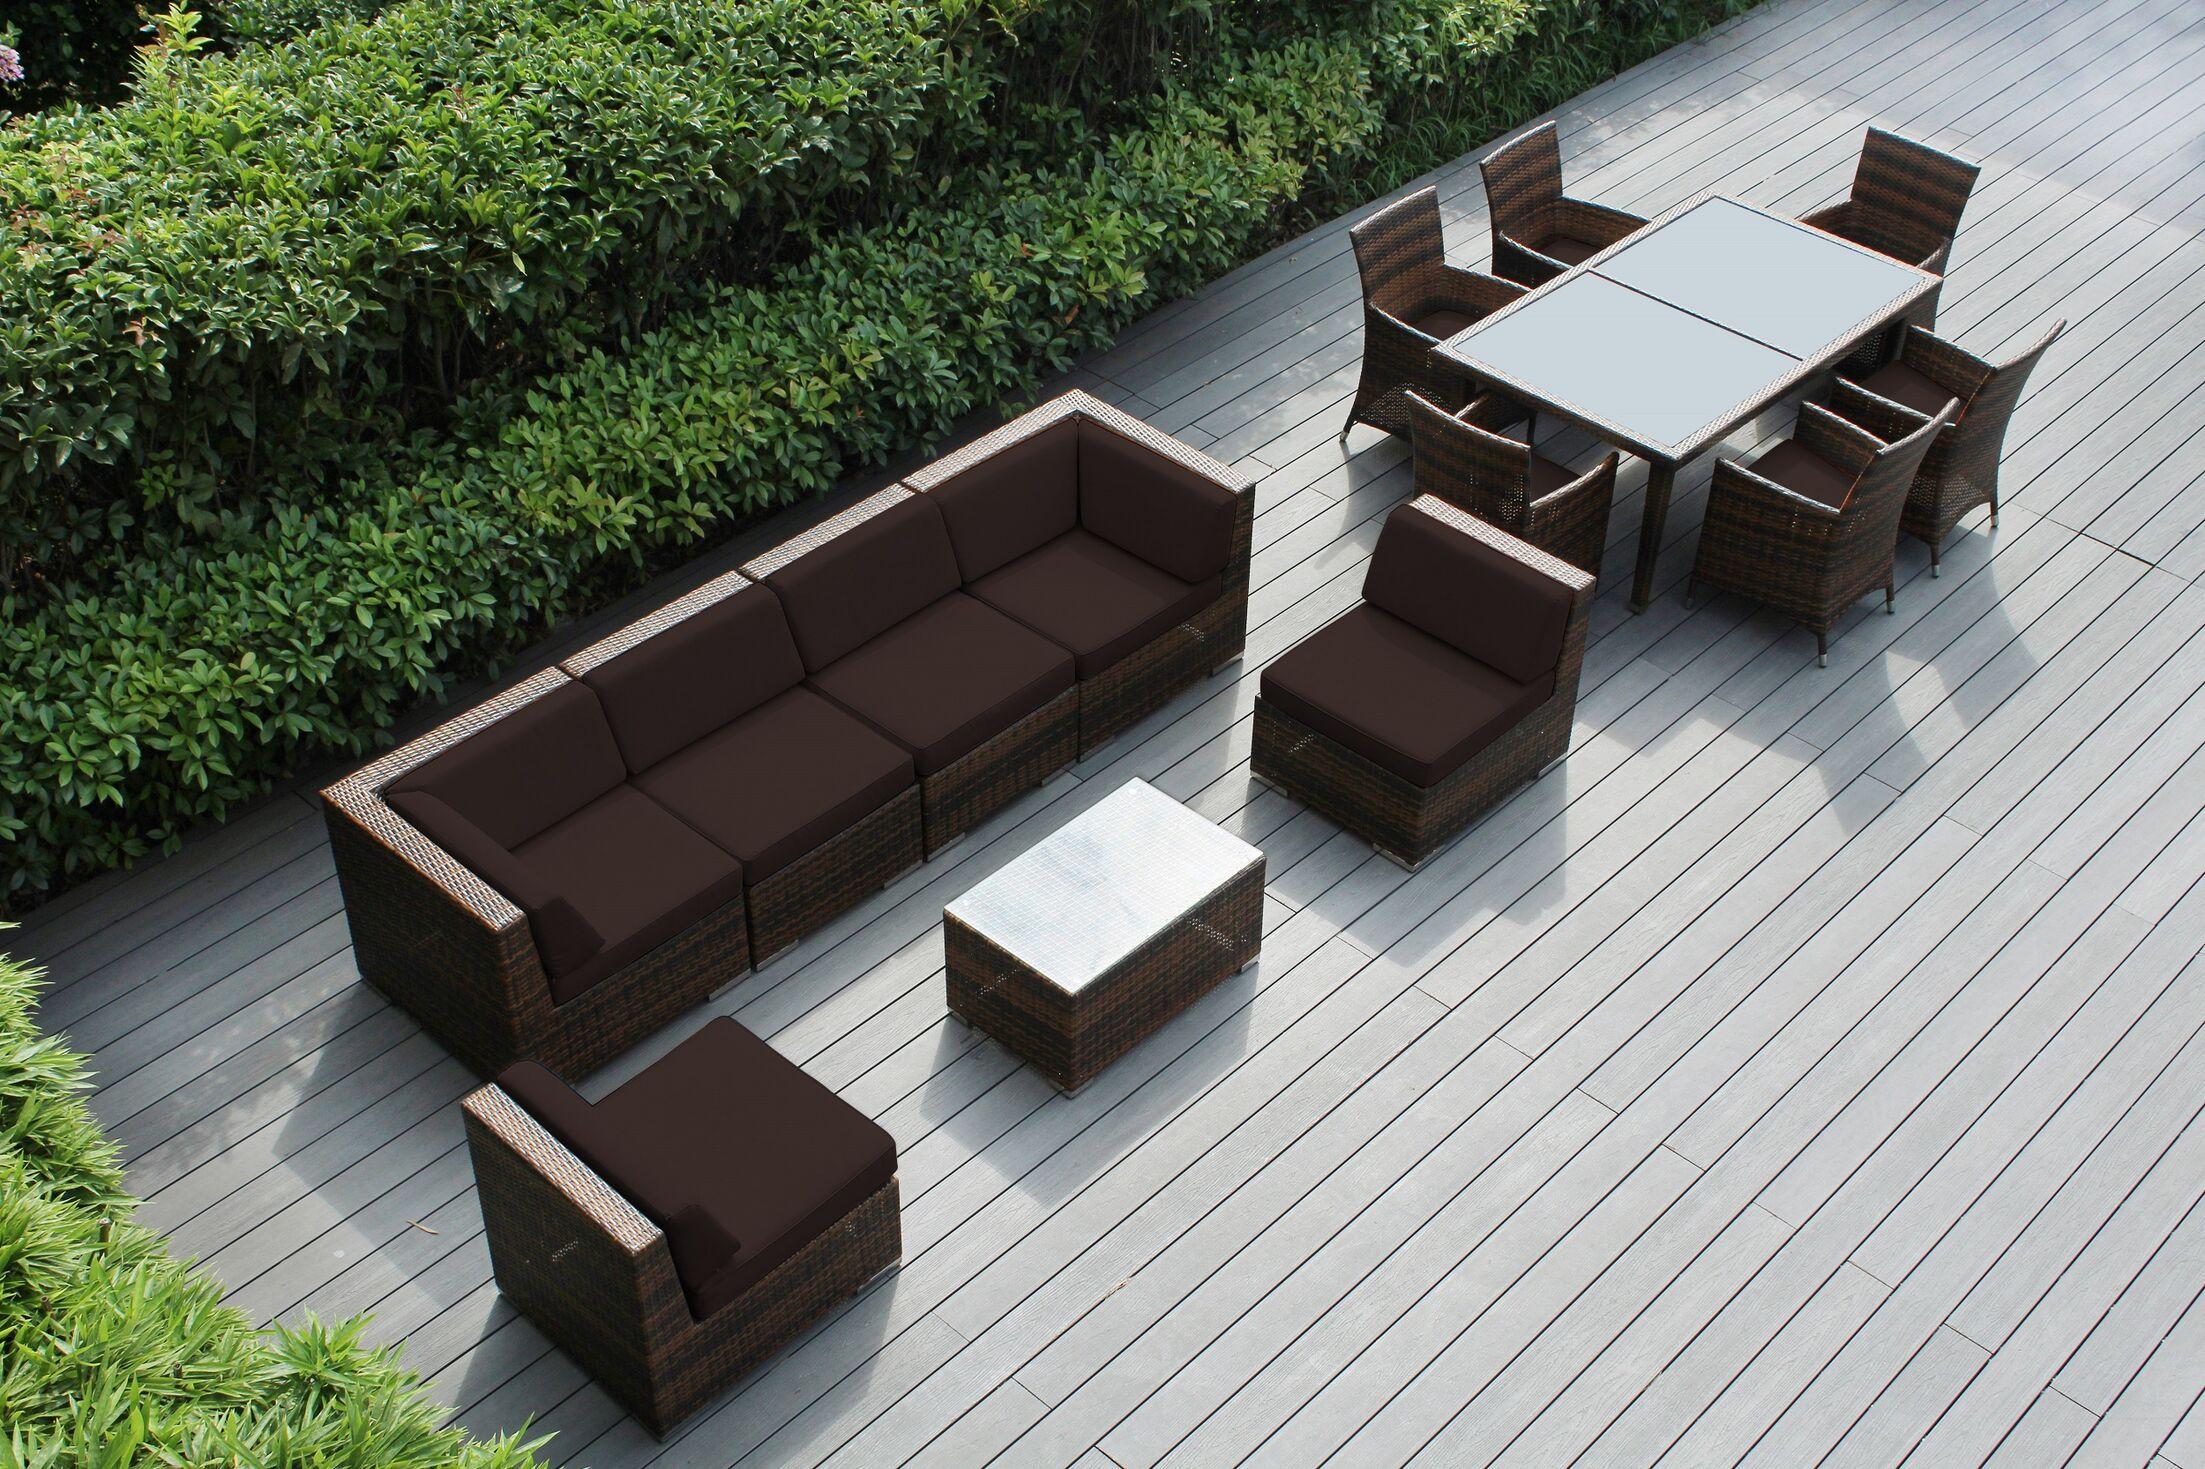 Ohana 14 Piece Complete Patio Set with Cushions Fabric: Sunbrella Bay Brown, Color: Black